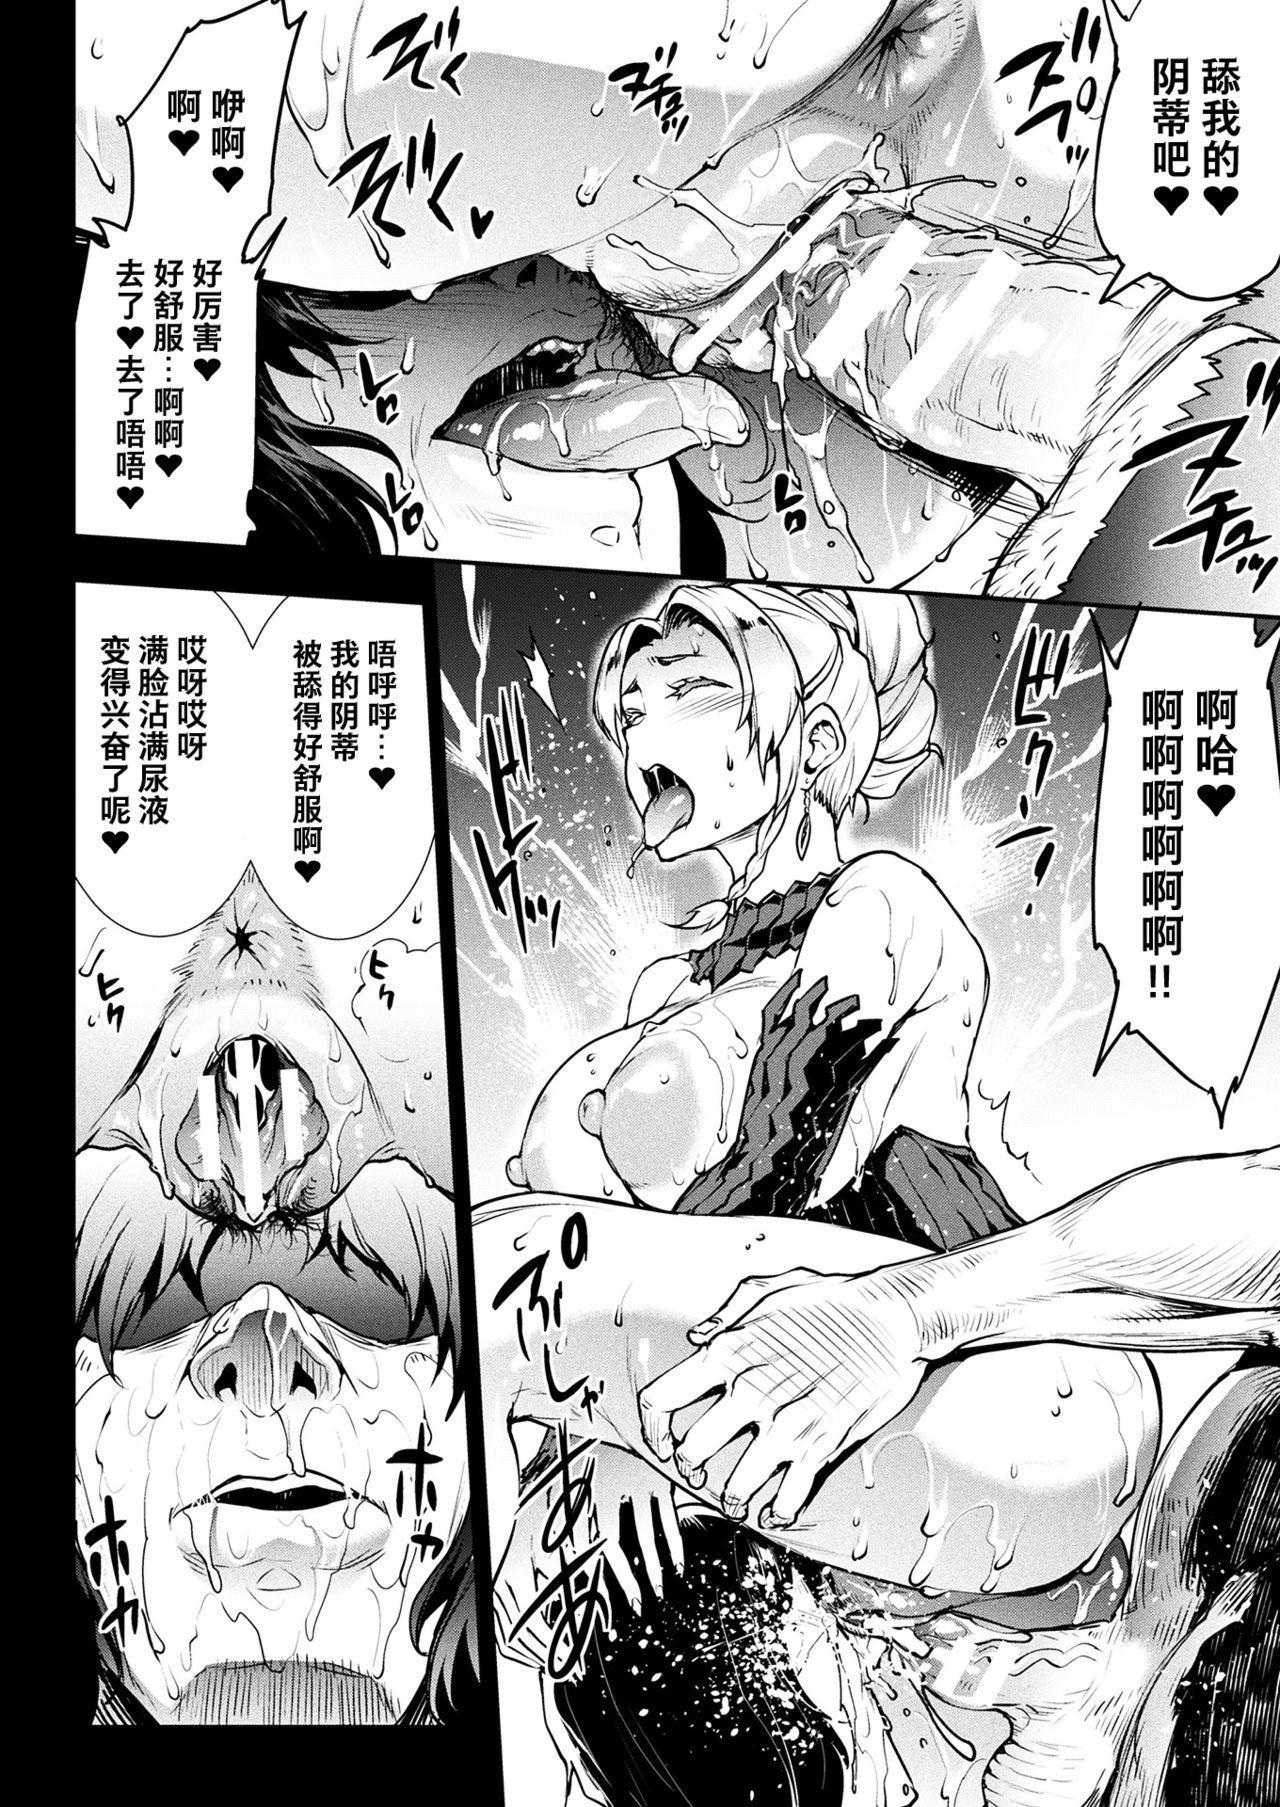 [Erect Sawaru] Raikou Shinki Igis Magia -PANDRA saga 3rd ignition- Ch. 24 (COMIC Unreal 2020-08 Vol. 86) [Chinese] [不咕鸟汉化组] [Digital] 15